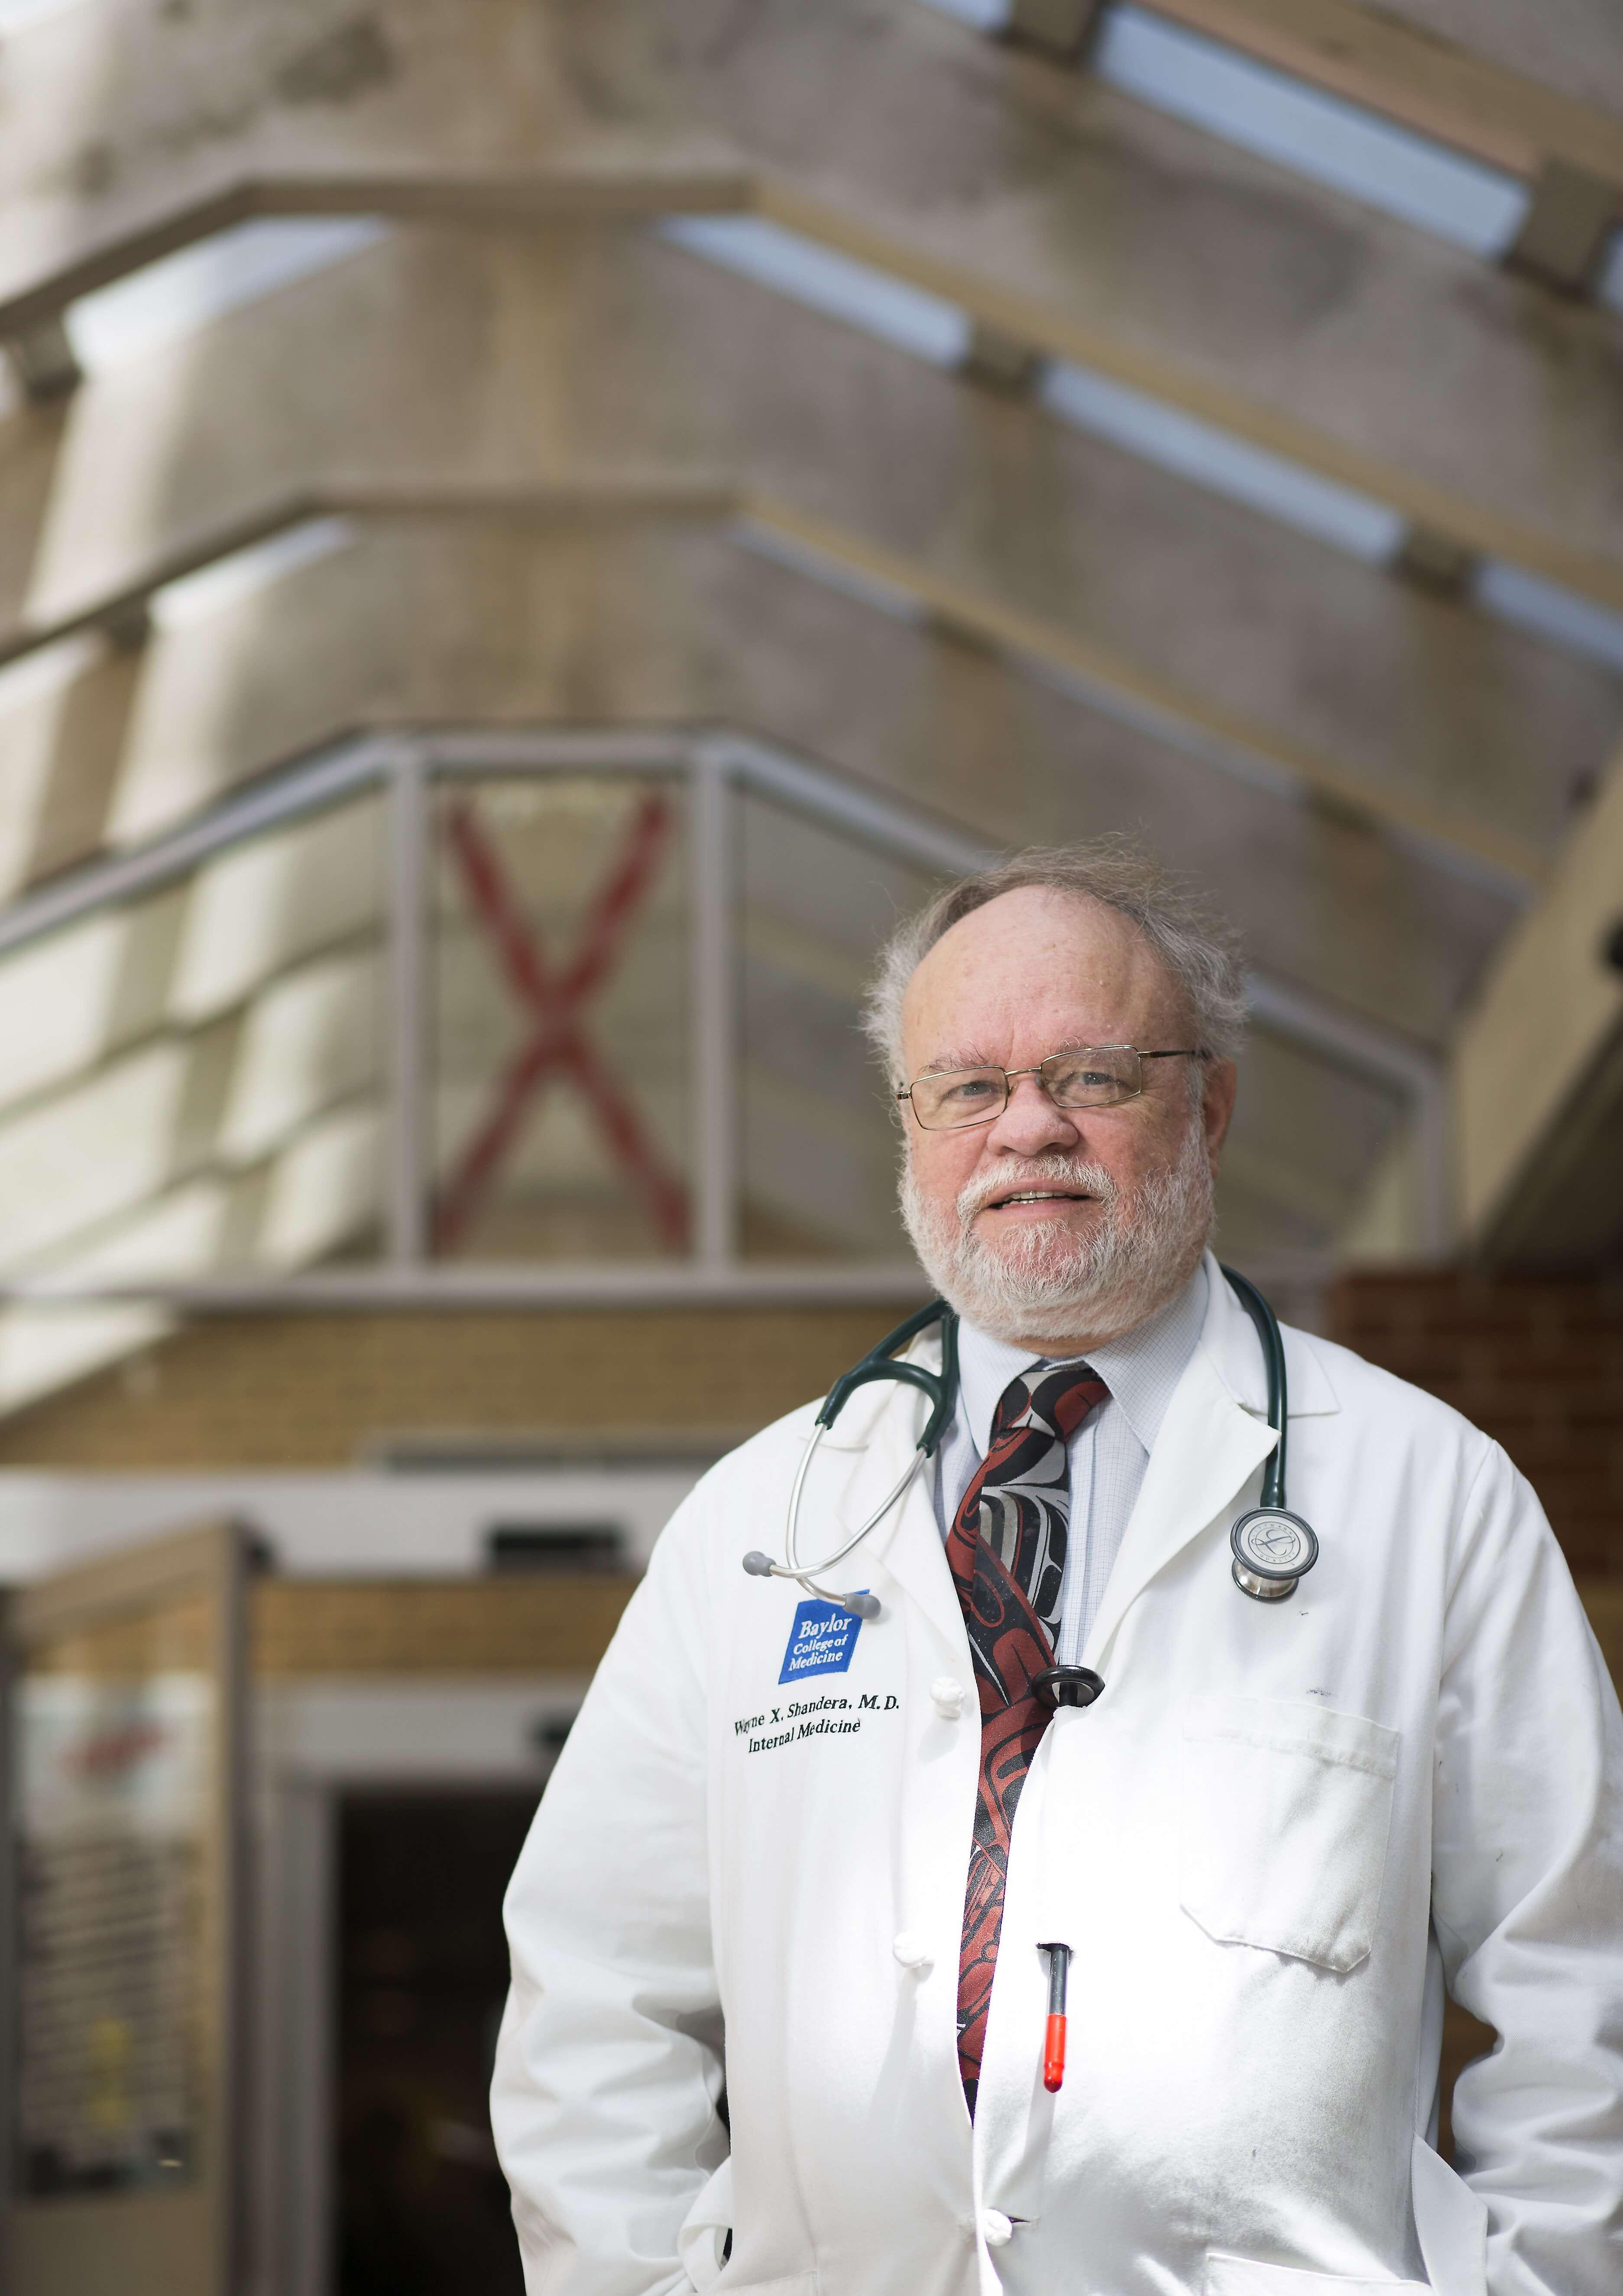 Wayne Shandera, M.D., infectious disease specialist at Thomas Street Health Center/Ben Taub Hospital and assistant professor of internal medicine and infectious disease at Baylor College of Medicine.